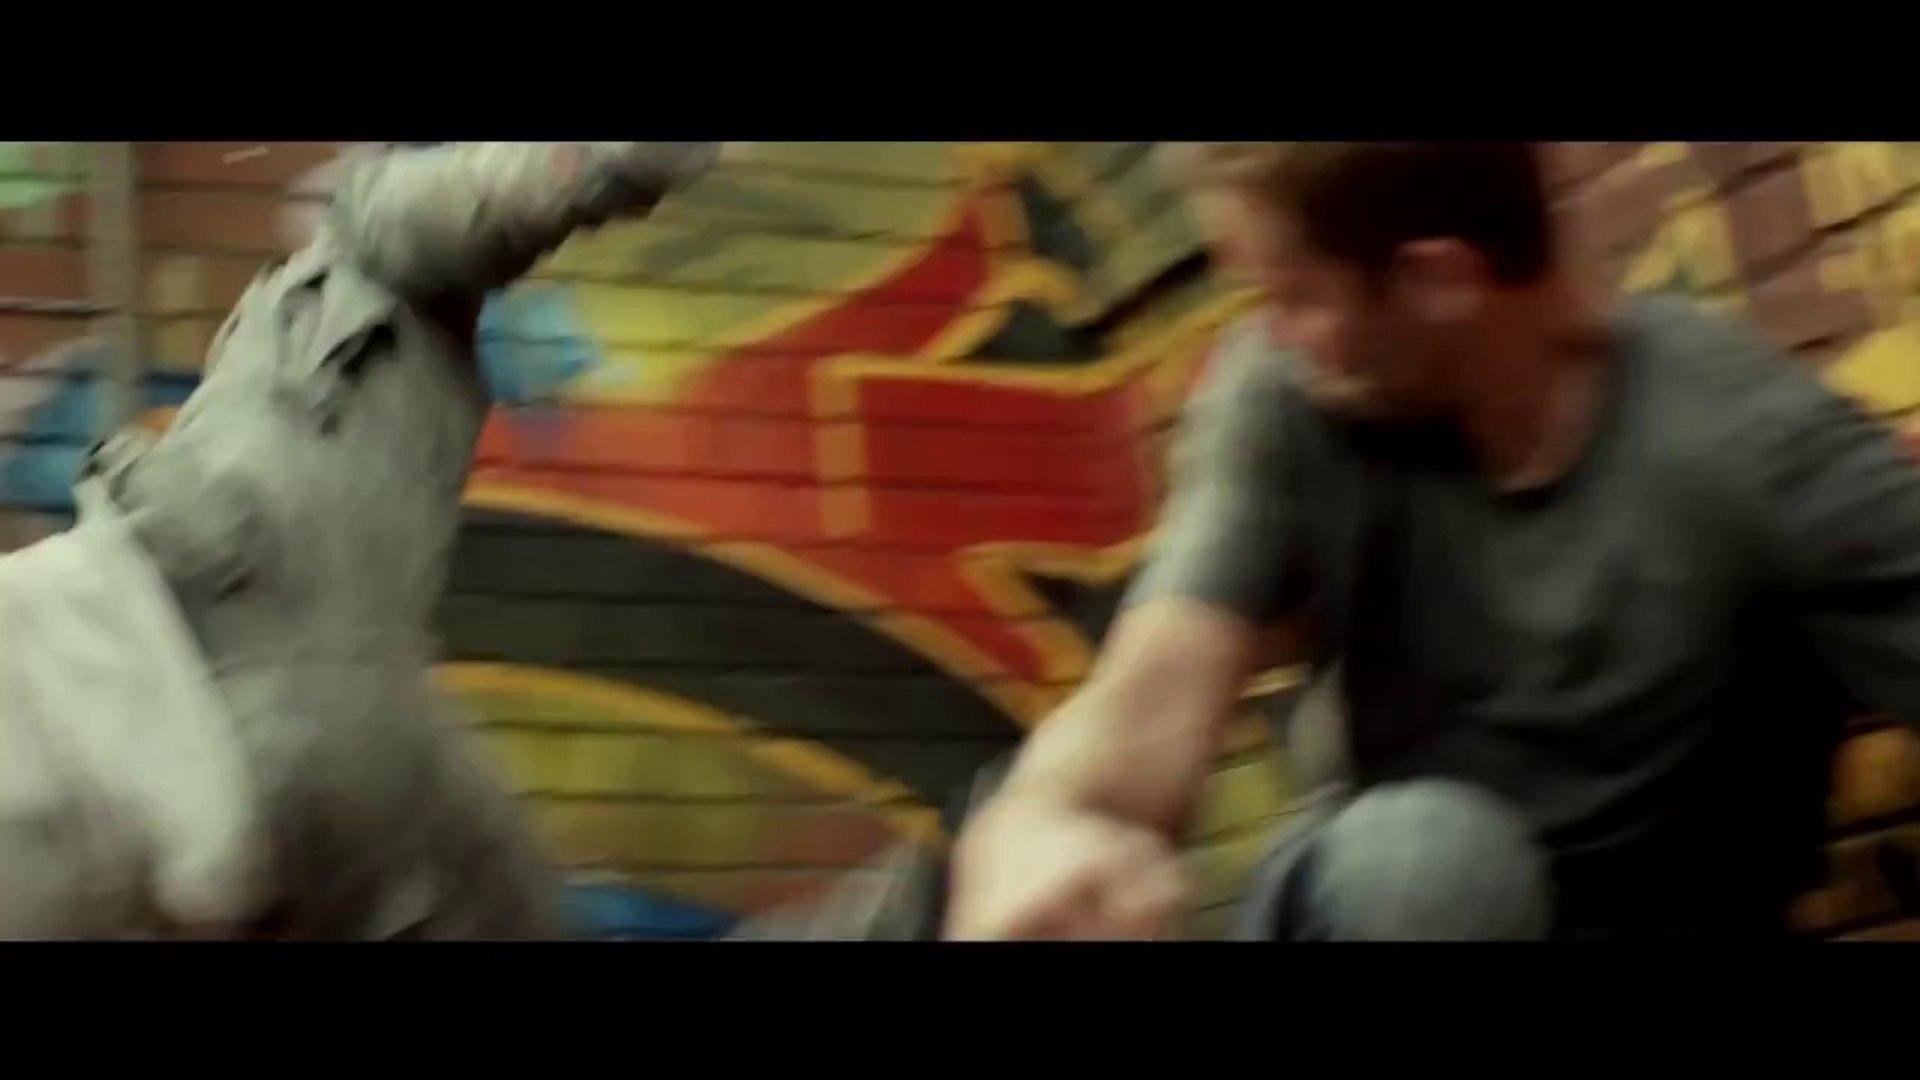 Paul Walker's Last Movie -Brick Mansions Trailer HD Trailer 2014 (Official All Videos Trailer)